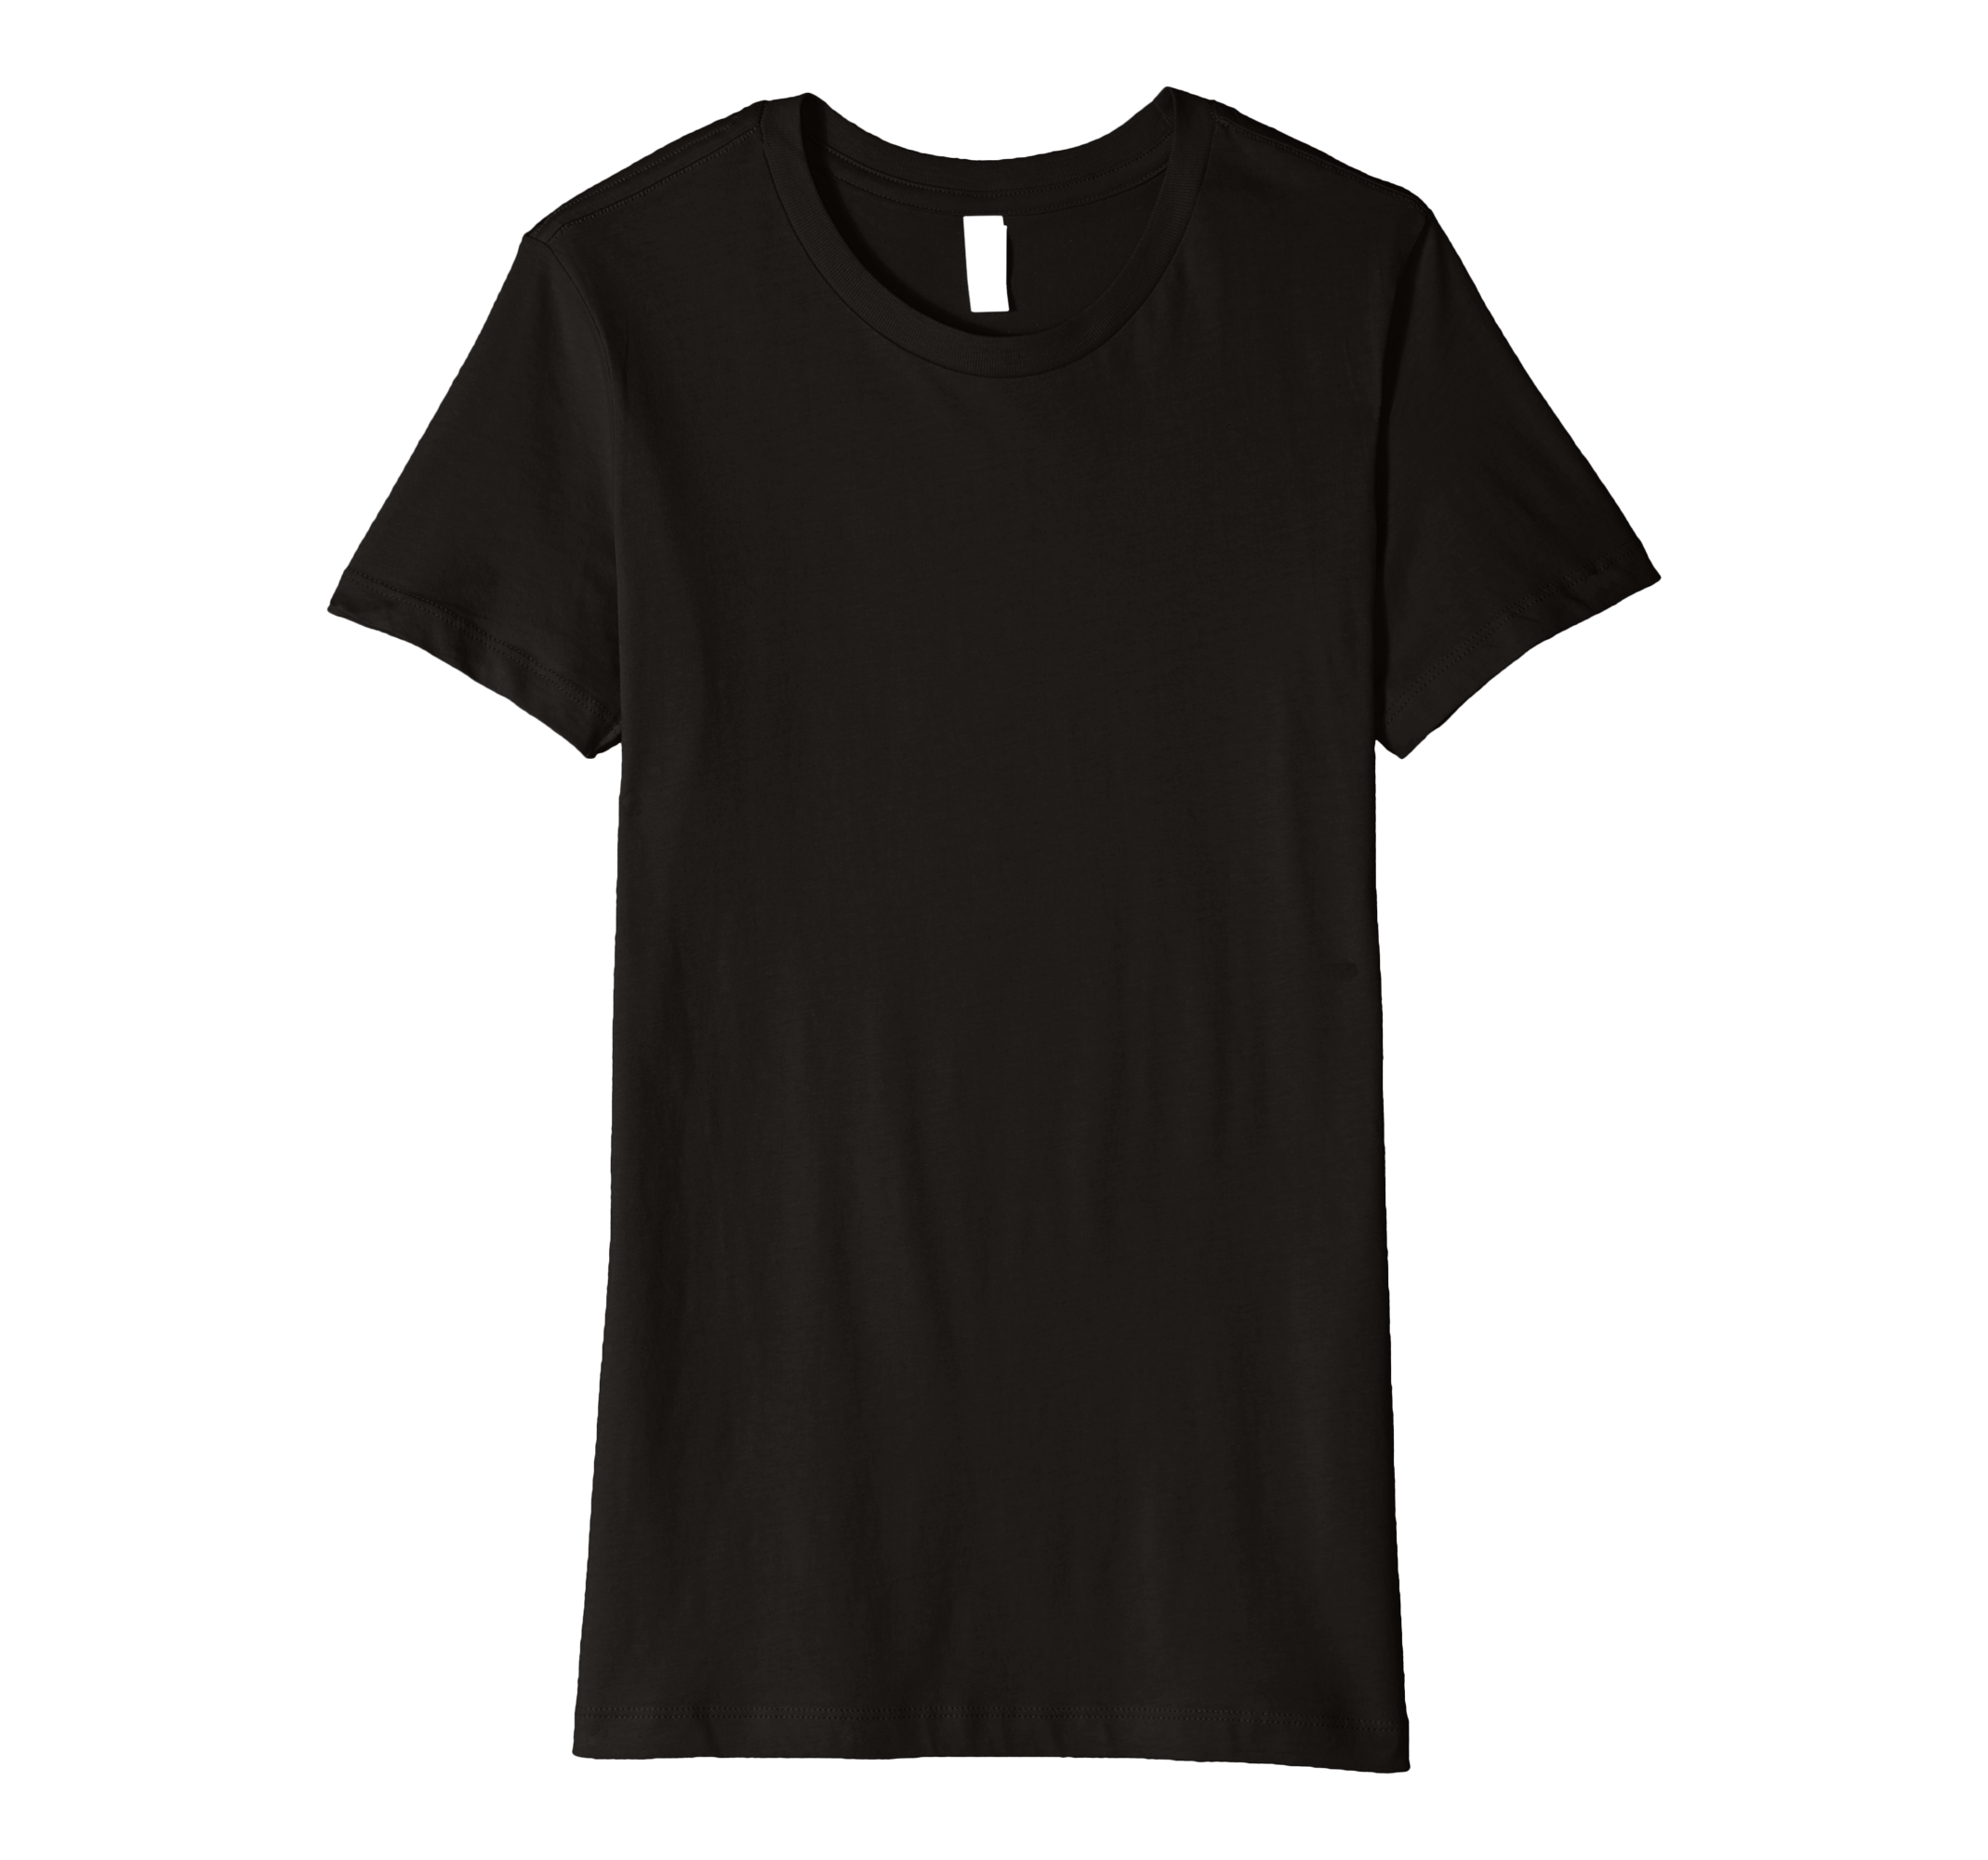 Walking Dead Daryl Dixon Fight The Dead Fear the Living KID/'S T-Shirt